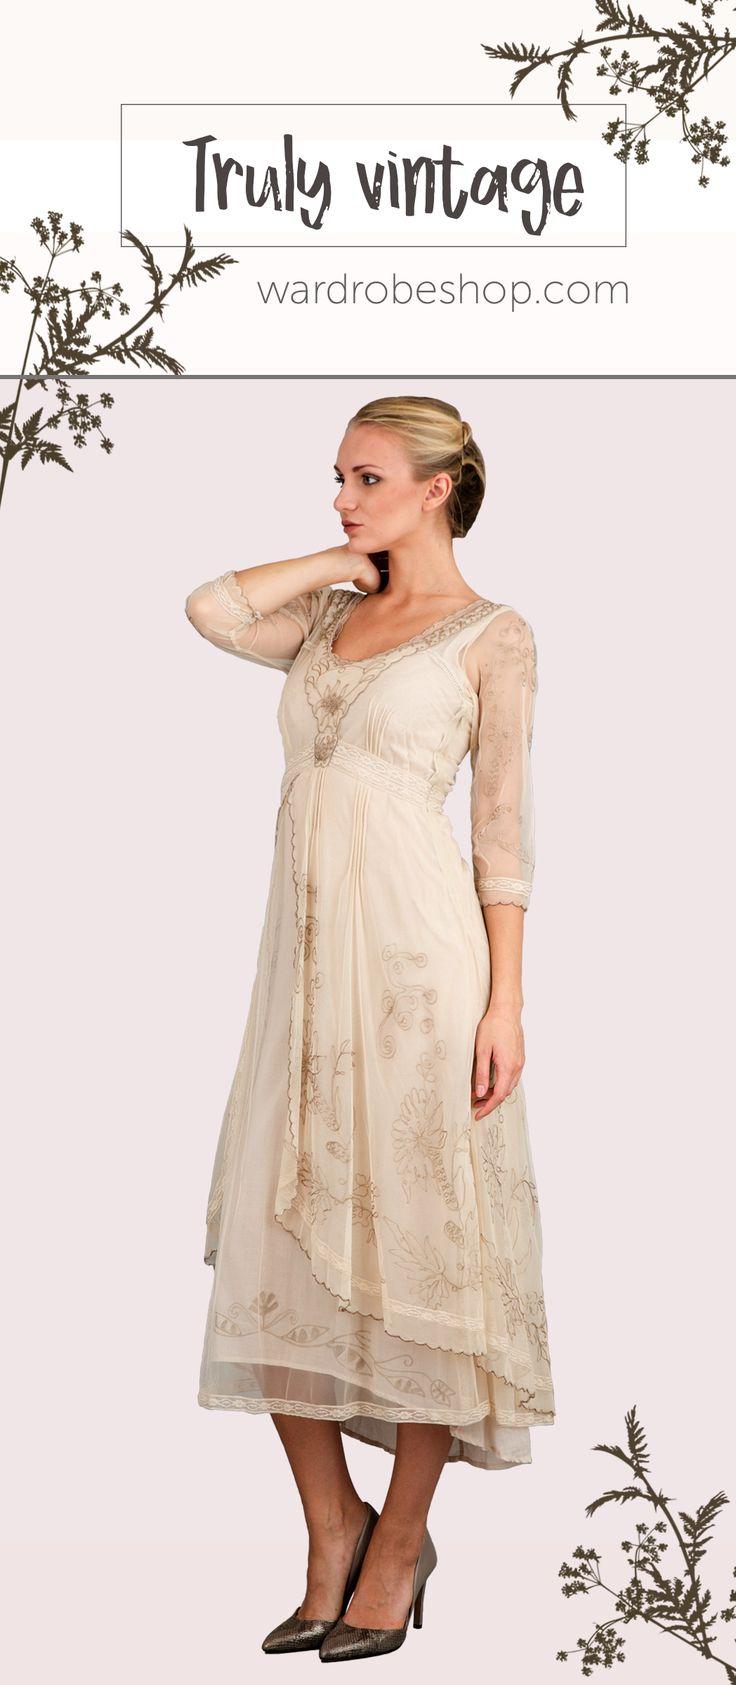 The 25+ best Second wedding dresses ideas on Pinterest ...